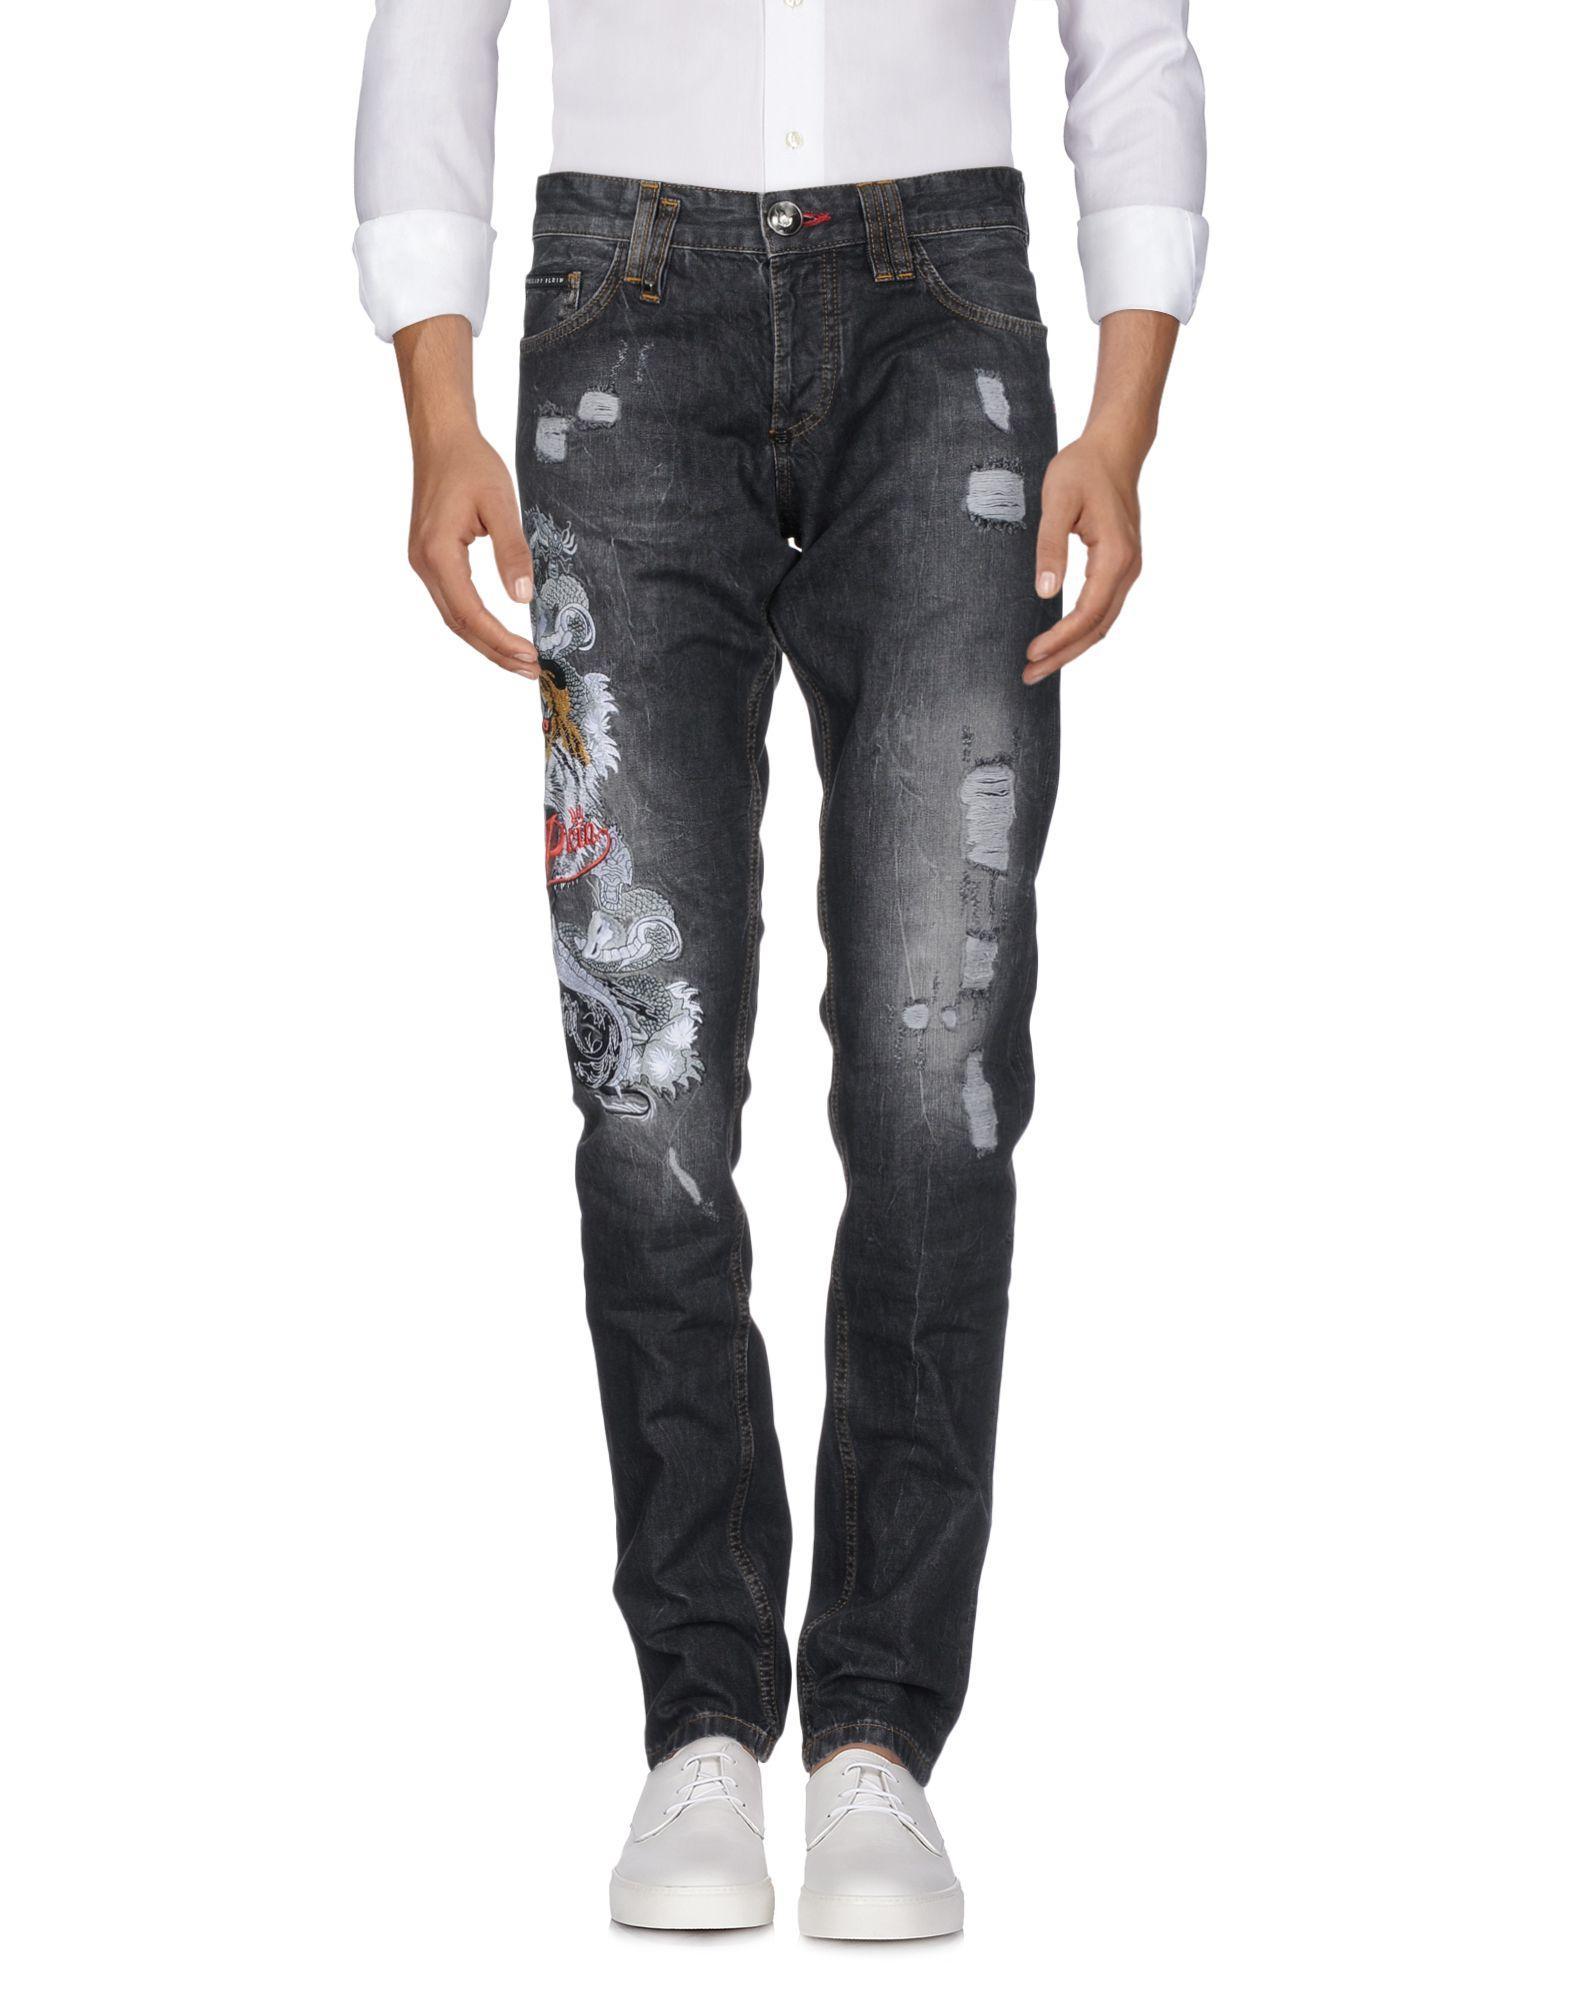 Philipp Plein Jeans In Black